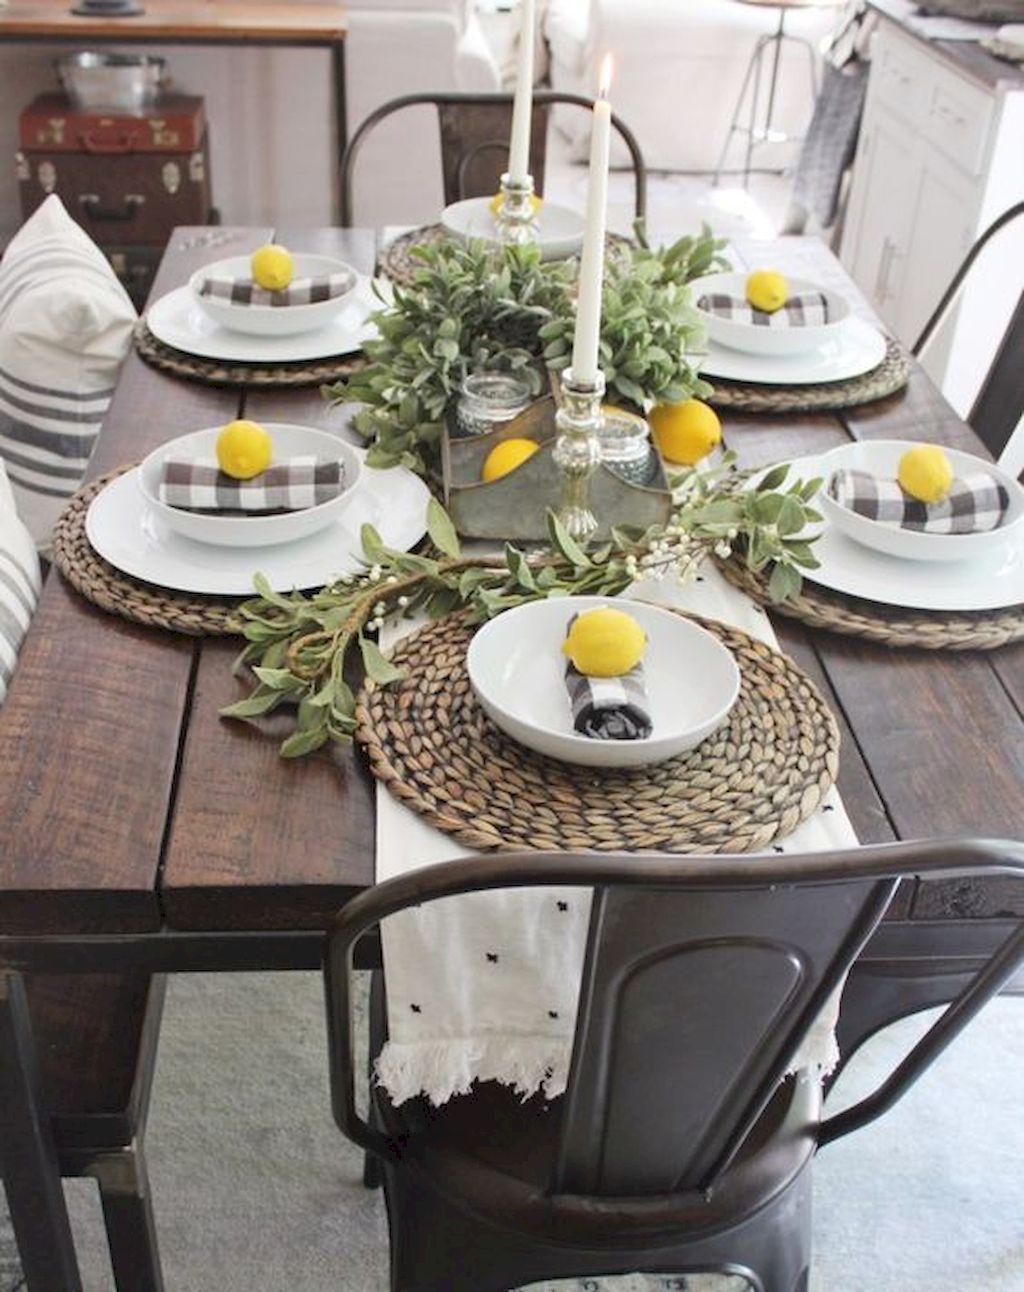 30 Pretty Dining Room Decoration Ideas For Summer Season Trenduhome Dining Room Table Decor Dining Room Table Centerpieces Dining Room Centerpiece